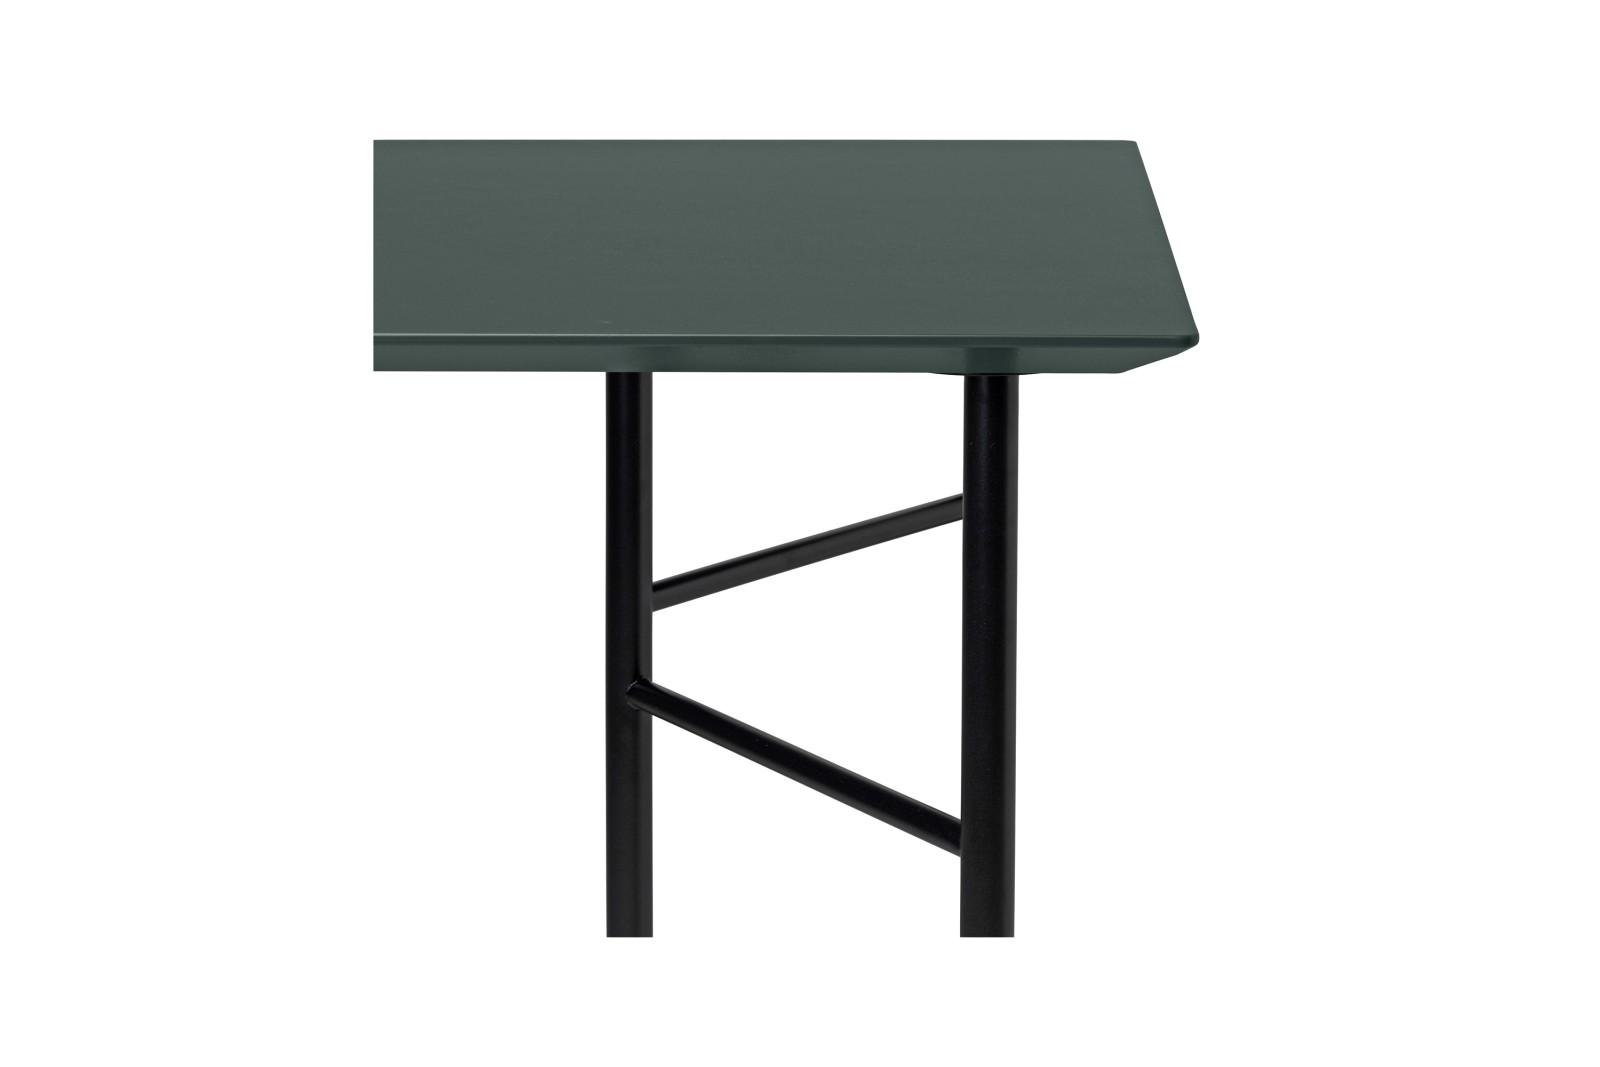 Mingle Table Top Green, 135cm